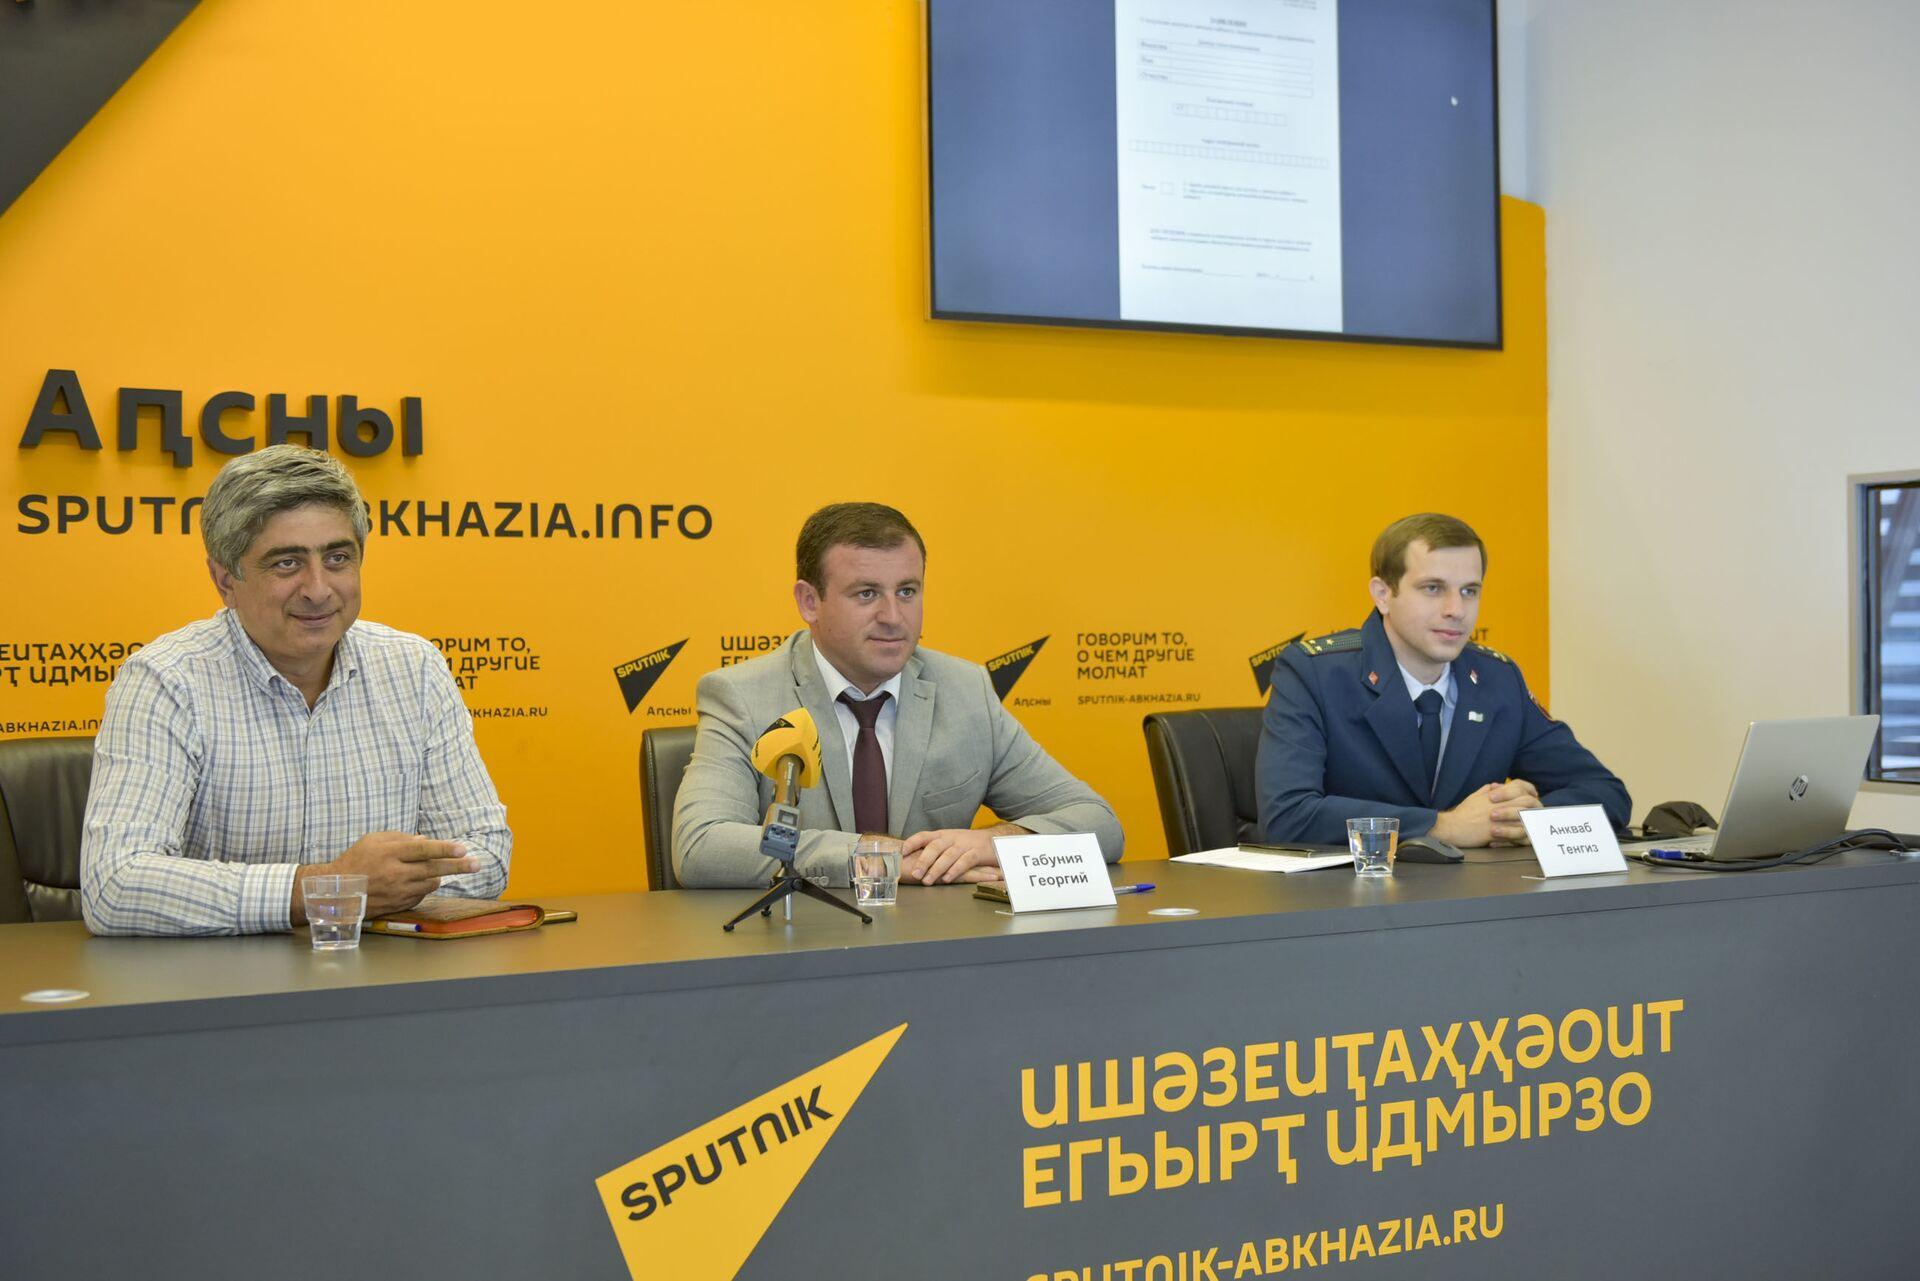 ПК в пресс - центре Sputnik Абхазия  - Sputnik Абхазия, 1920, 12.10.2021